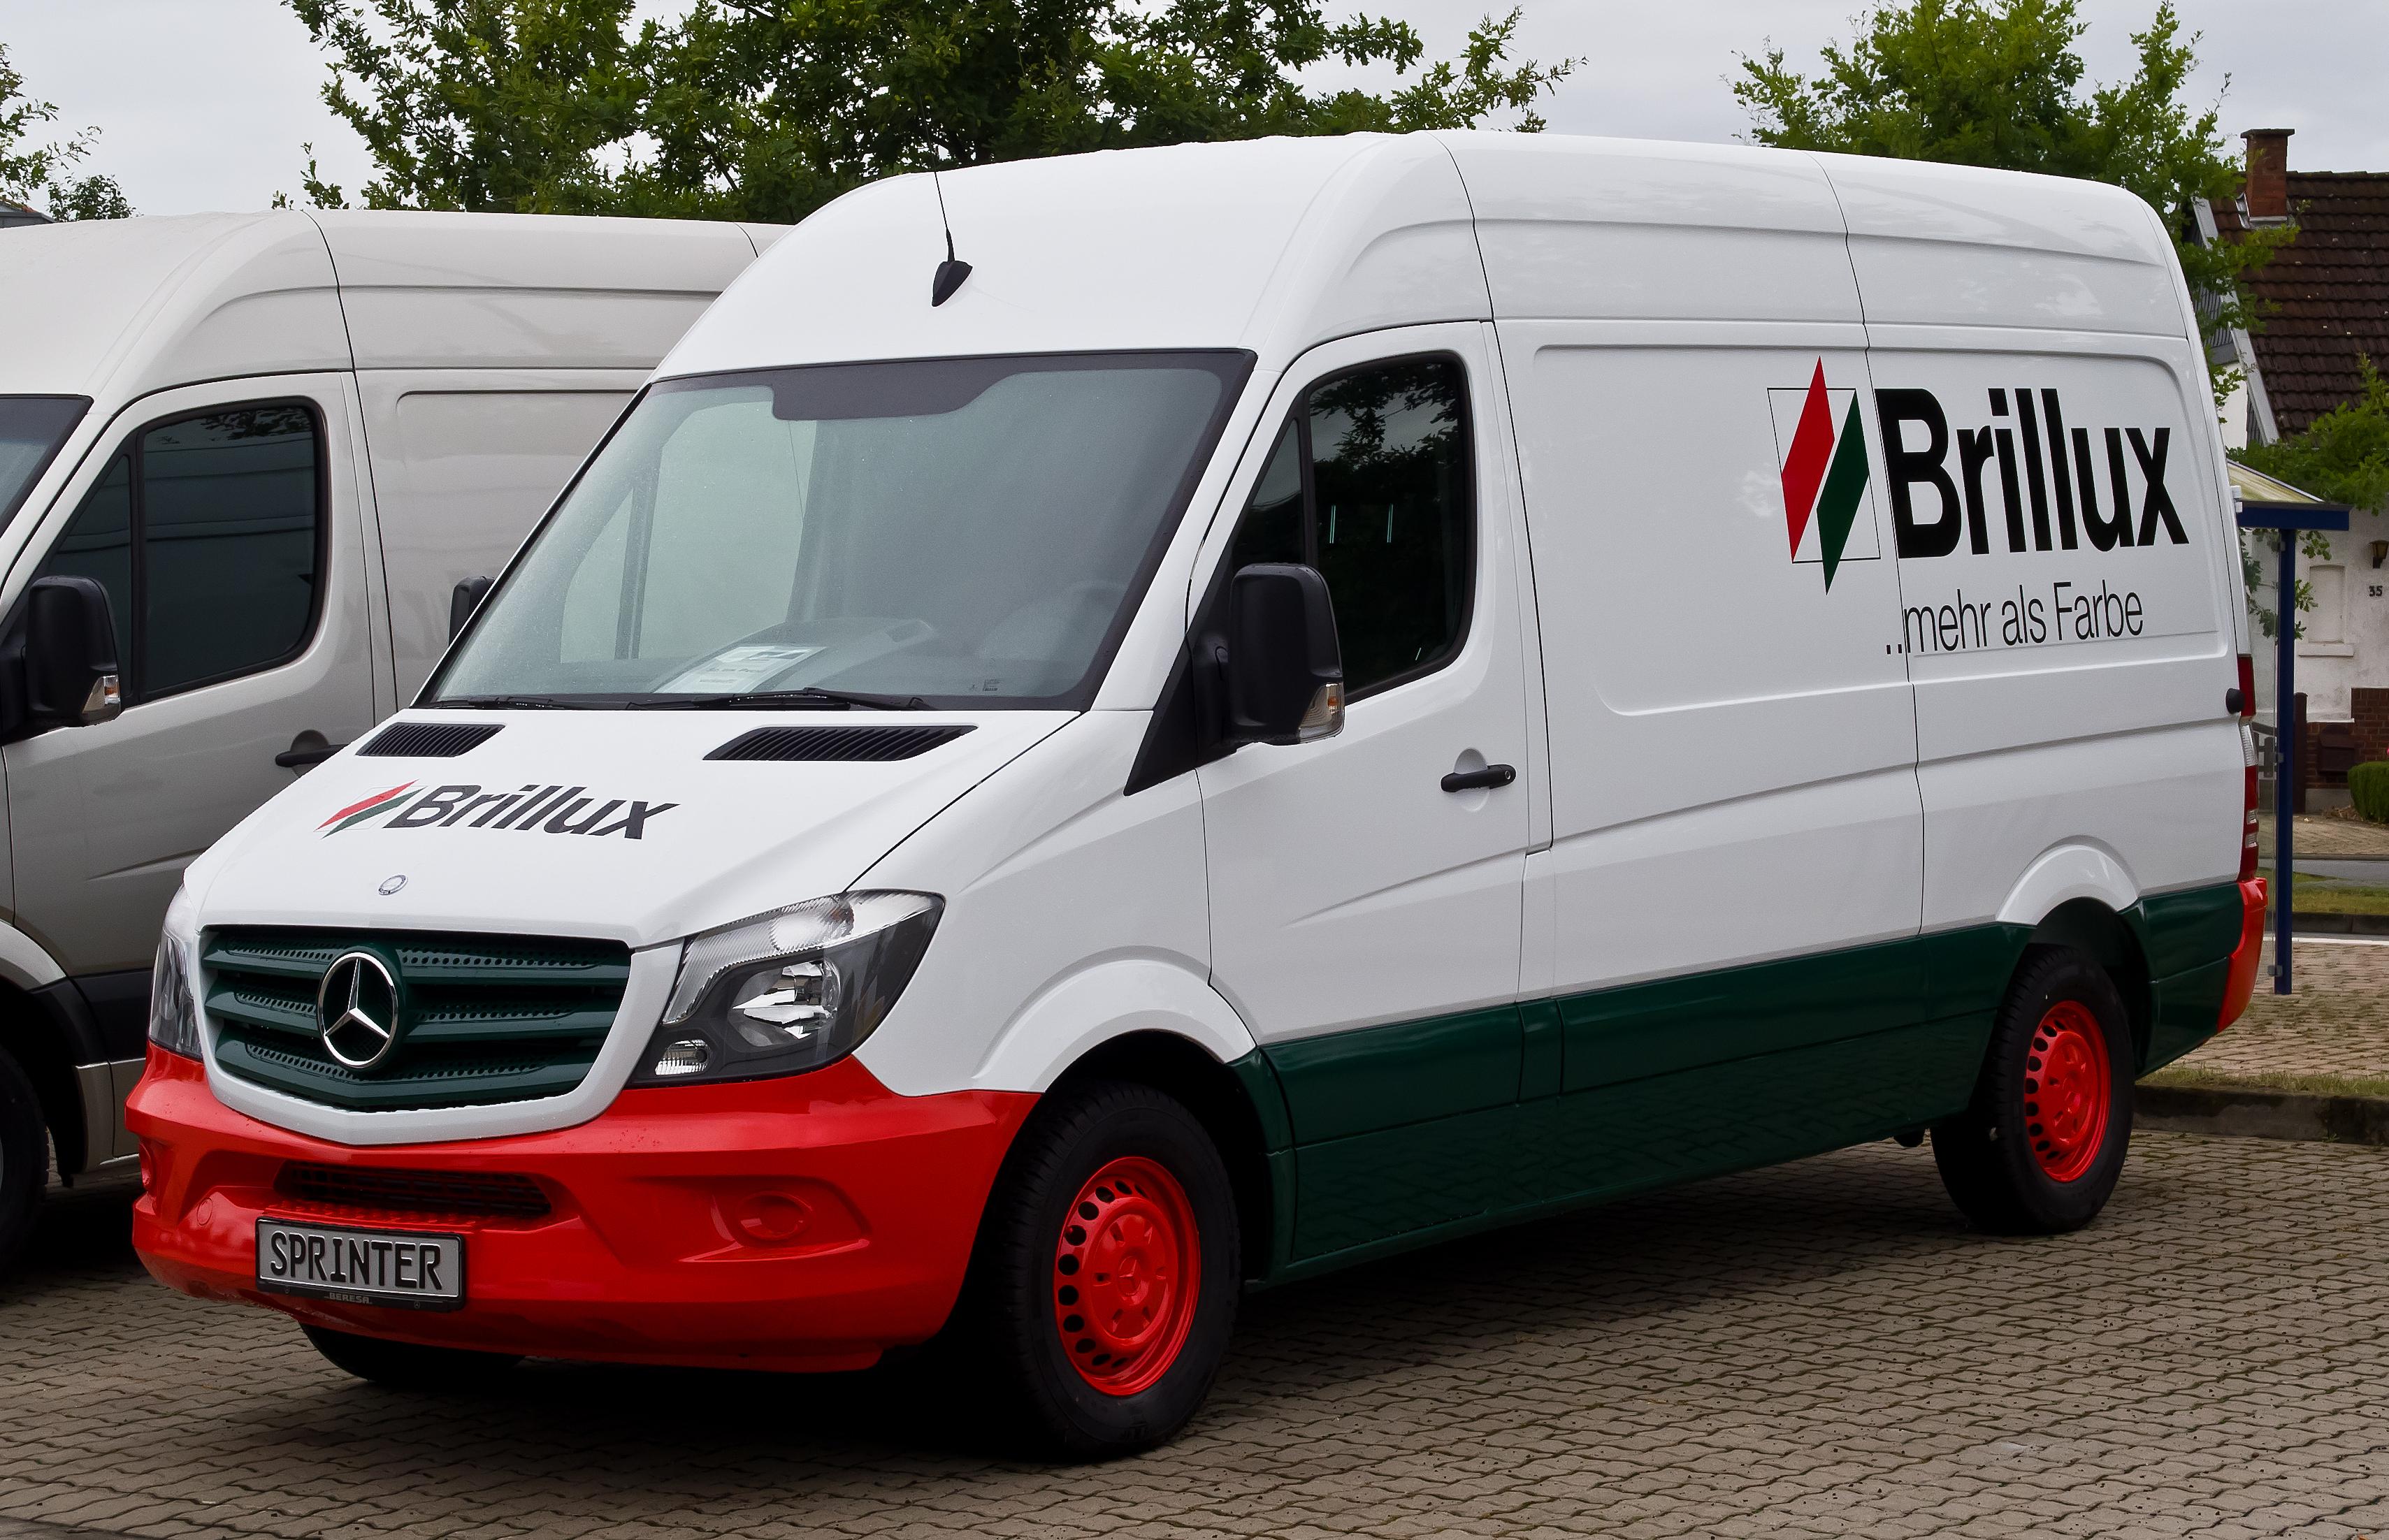 Gas mileage for 2015 mercedes sprinter van autos post for Mercedes benz sprinter gas mileage